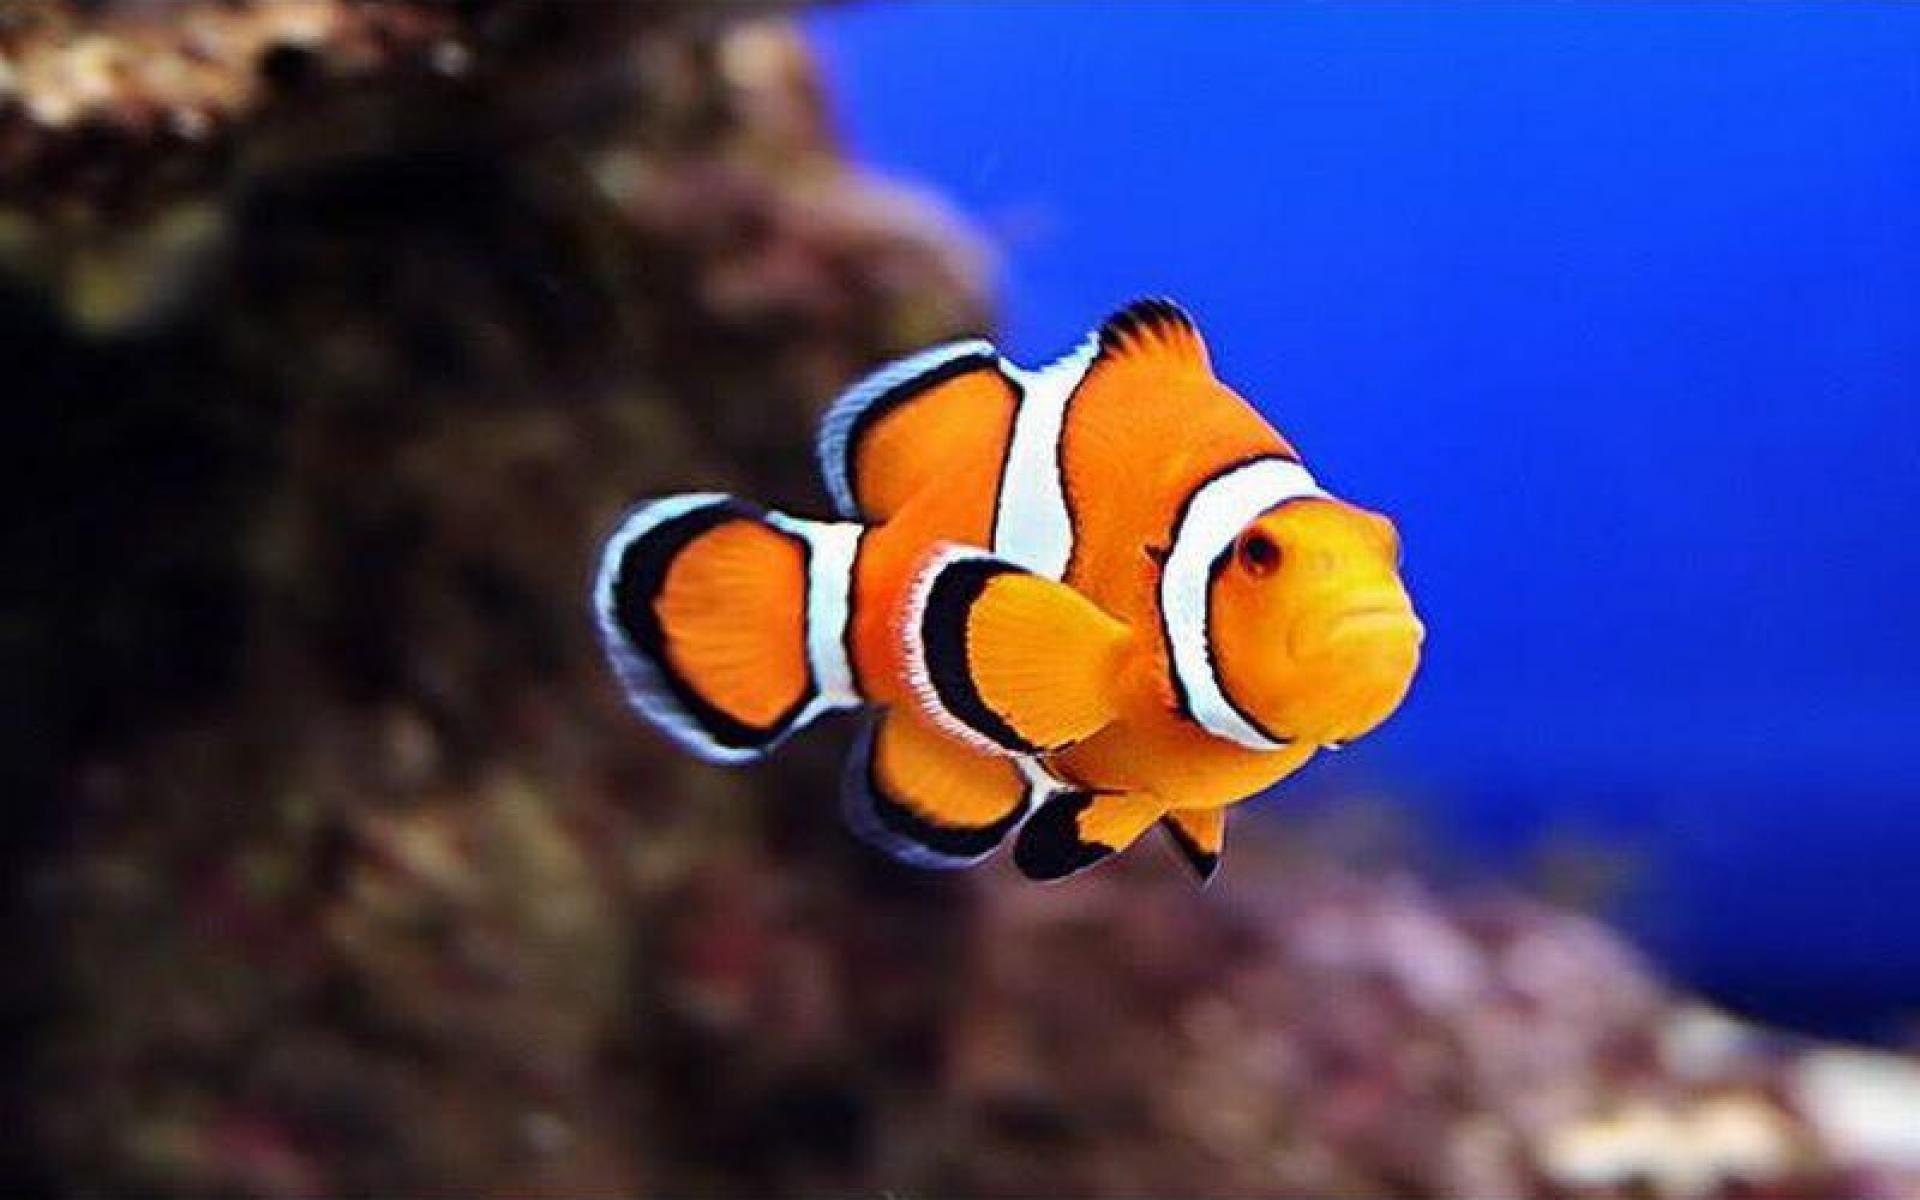 Apple Clownfish Wallpaper Iphone X Clown Fish Wallpaper 183 ① Wallpapertag